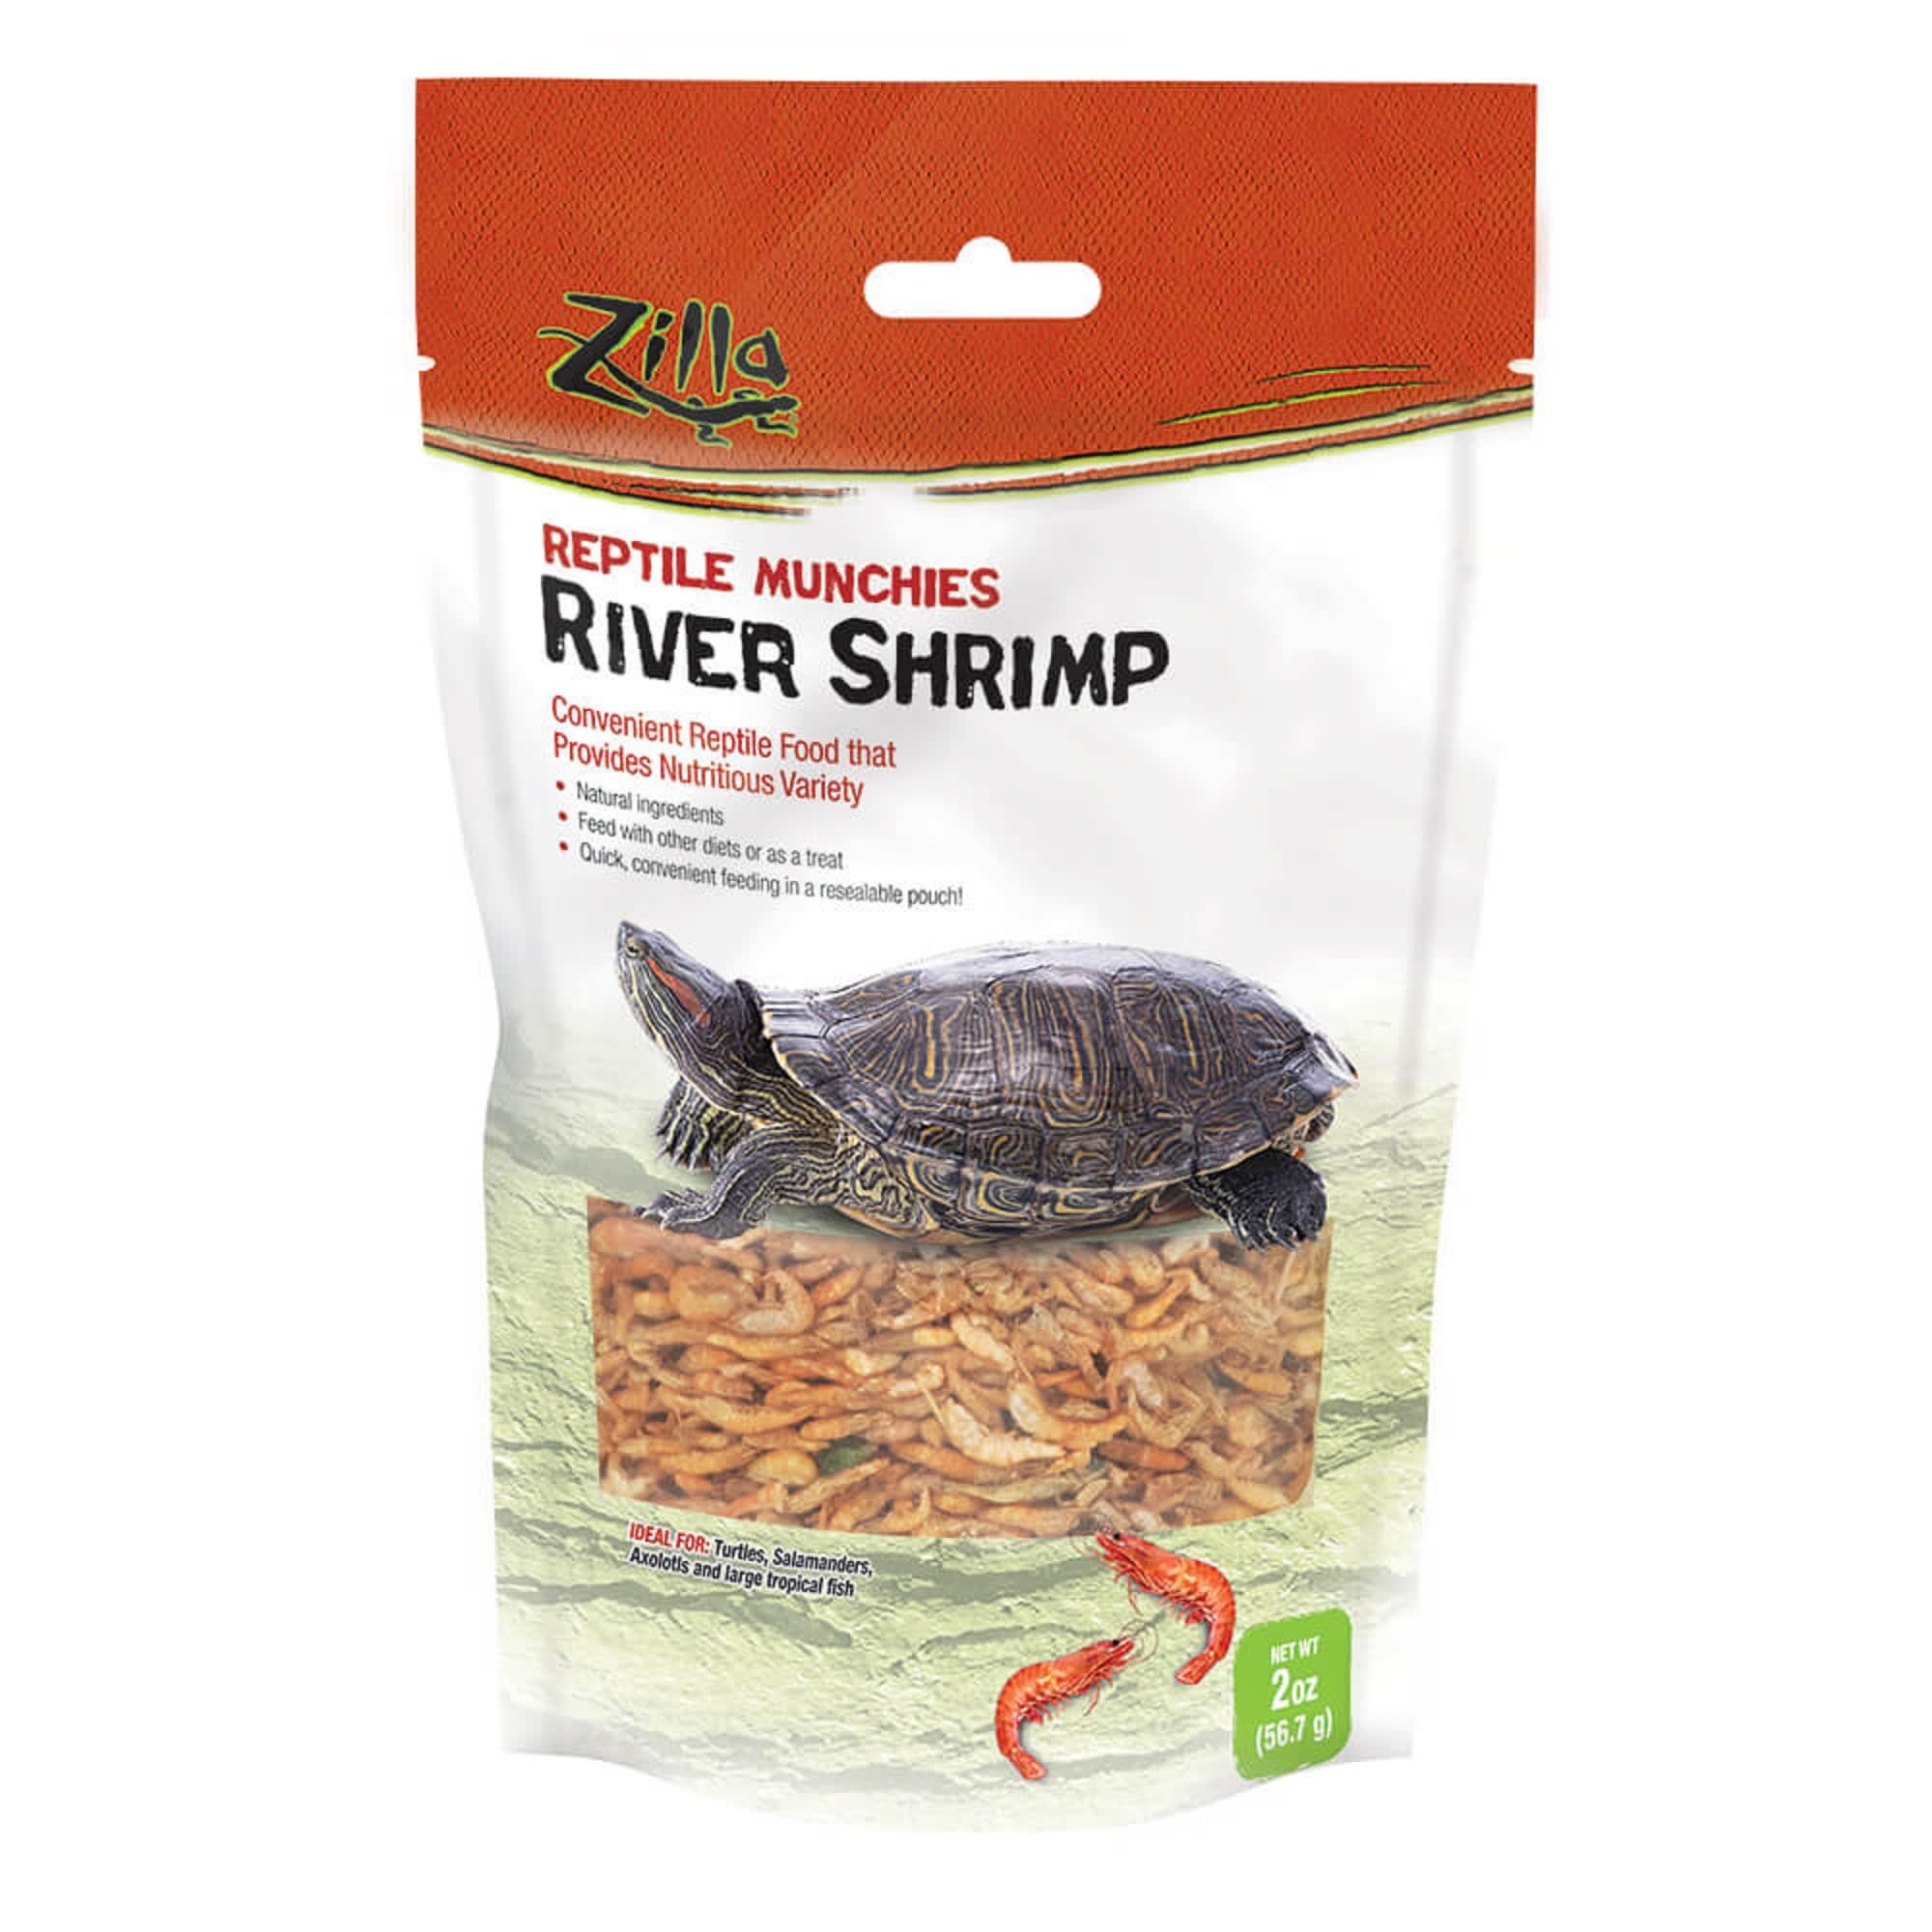 Zilla Munchies River Shrimp Reptile Food 2 Oz Petco